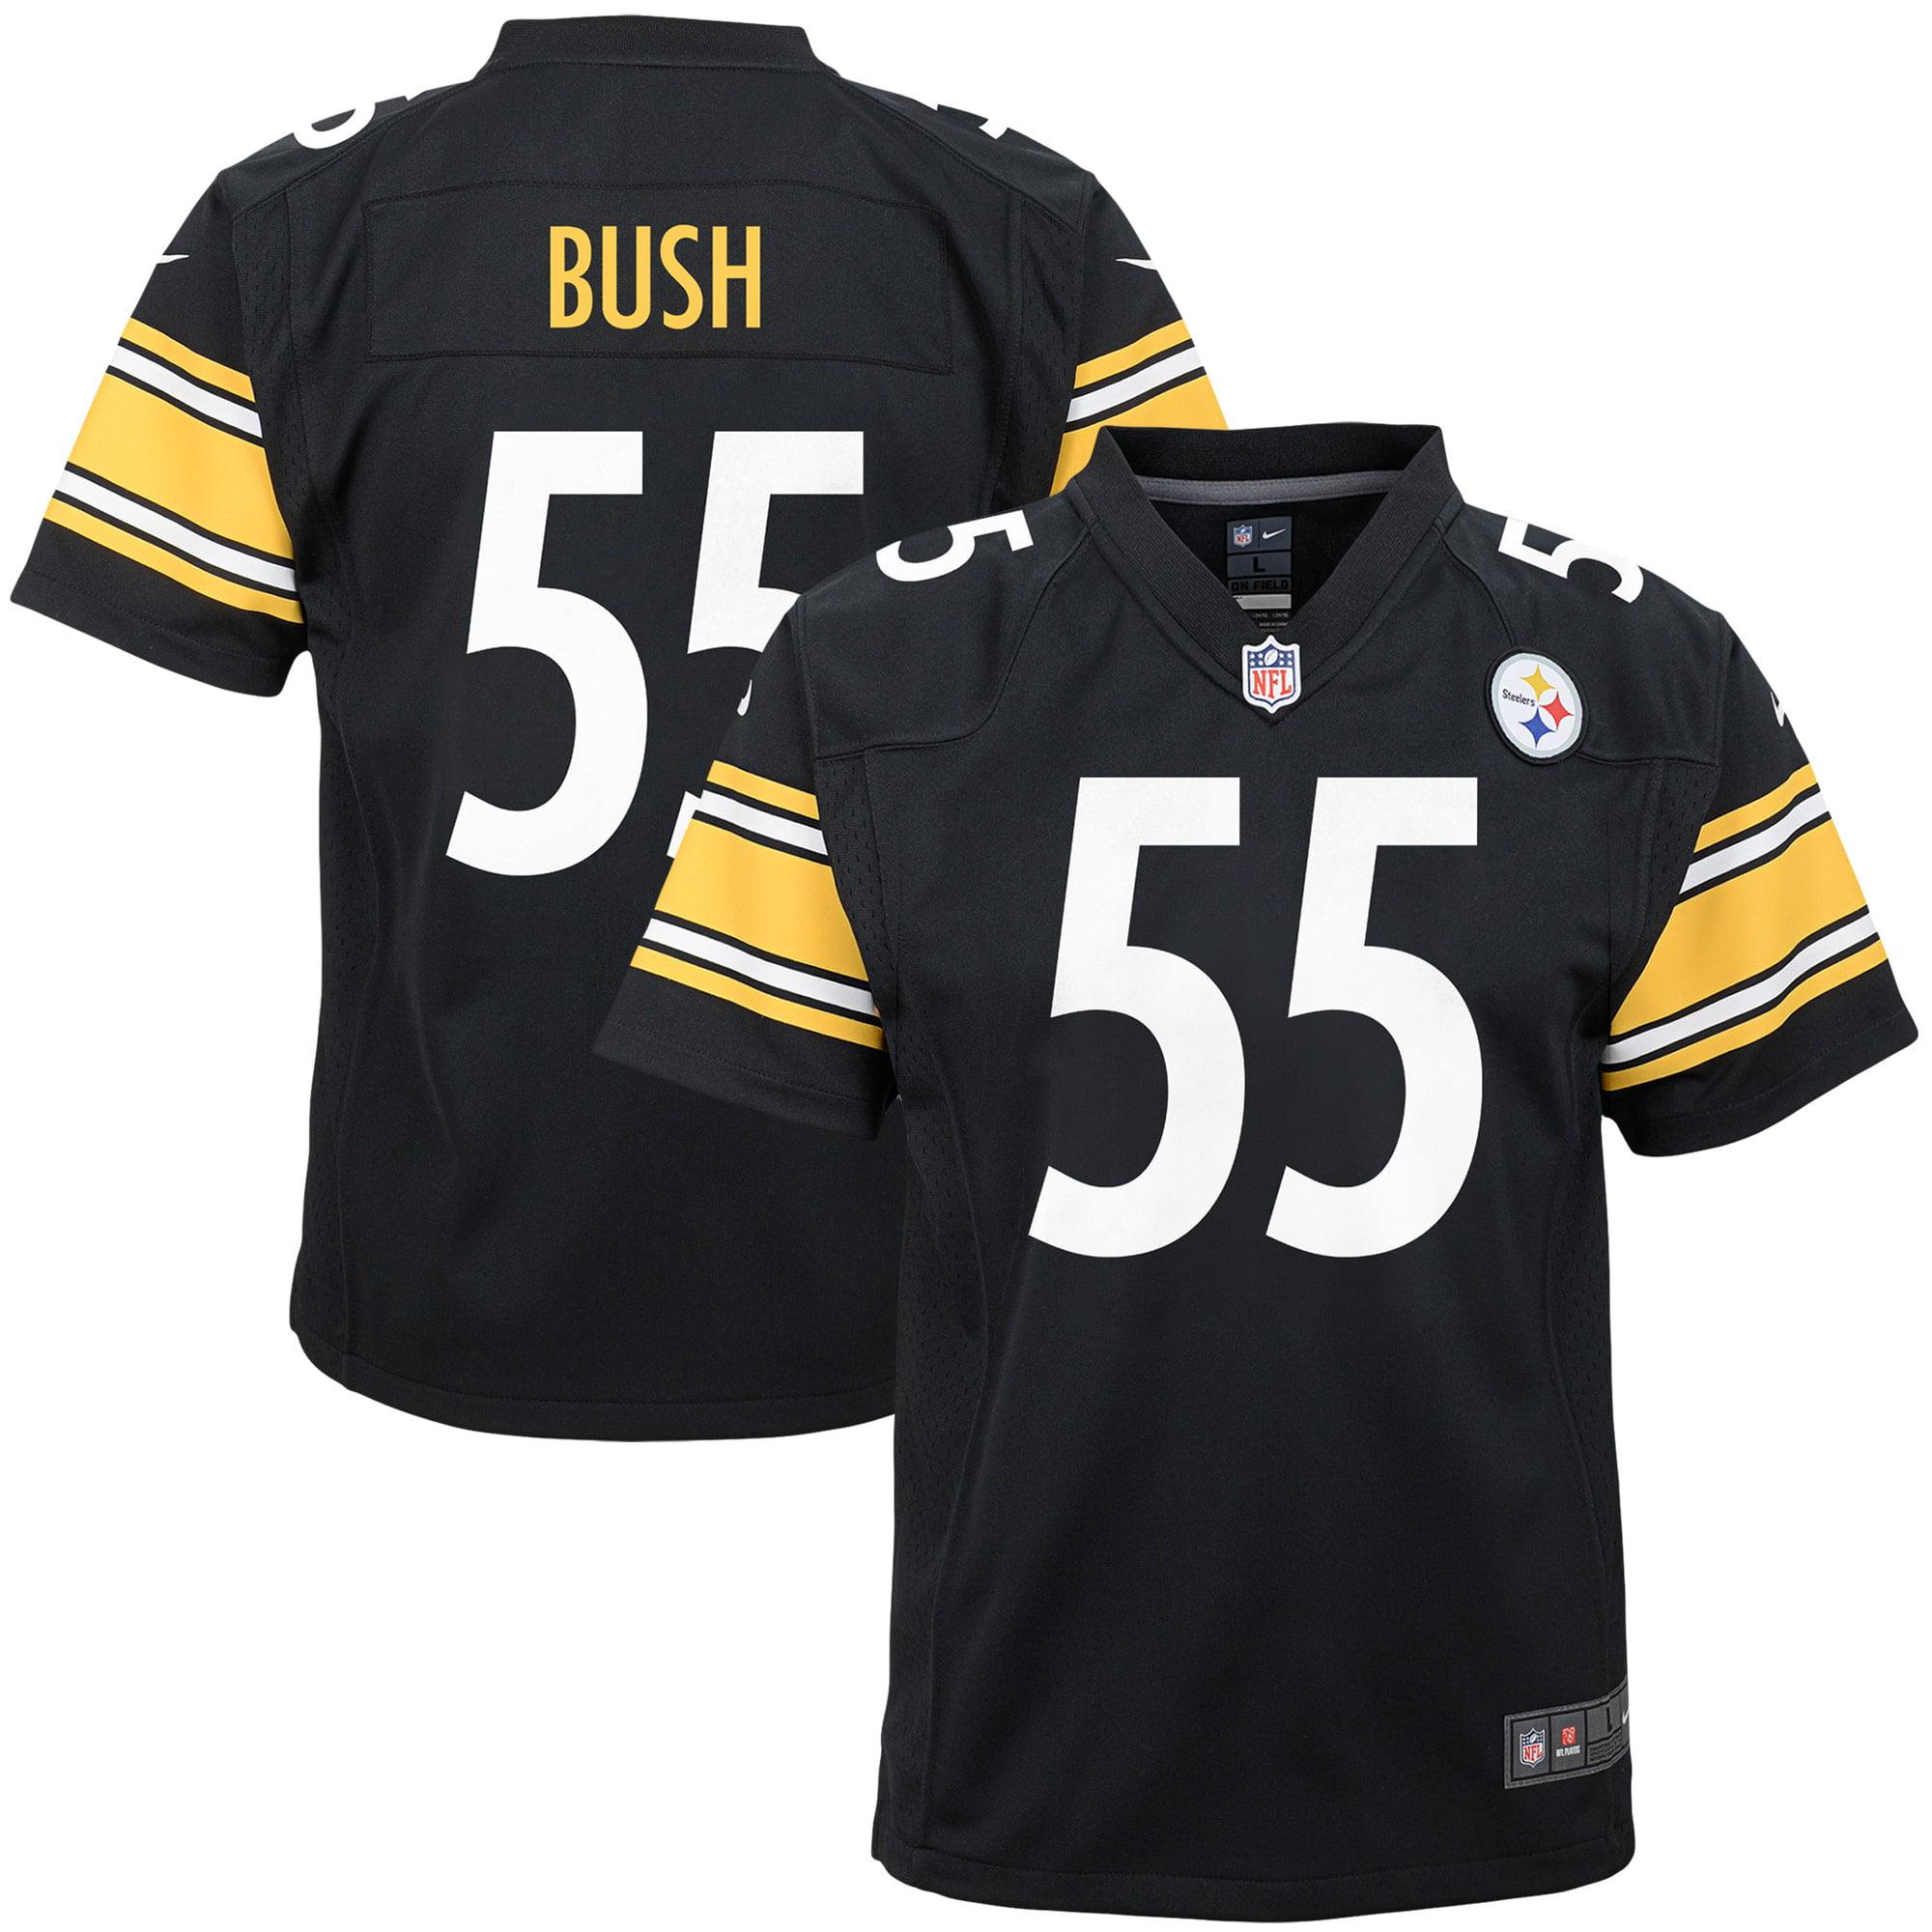 bush jersey